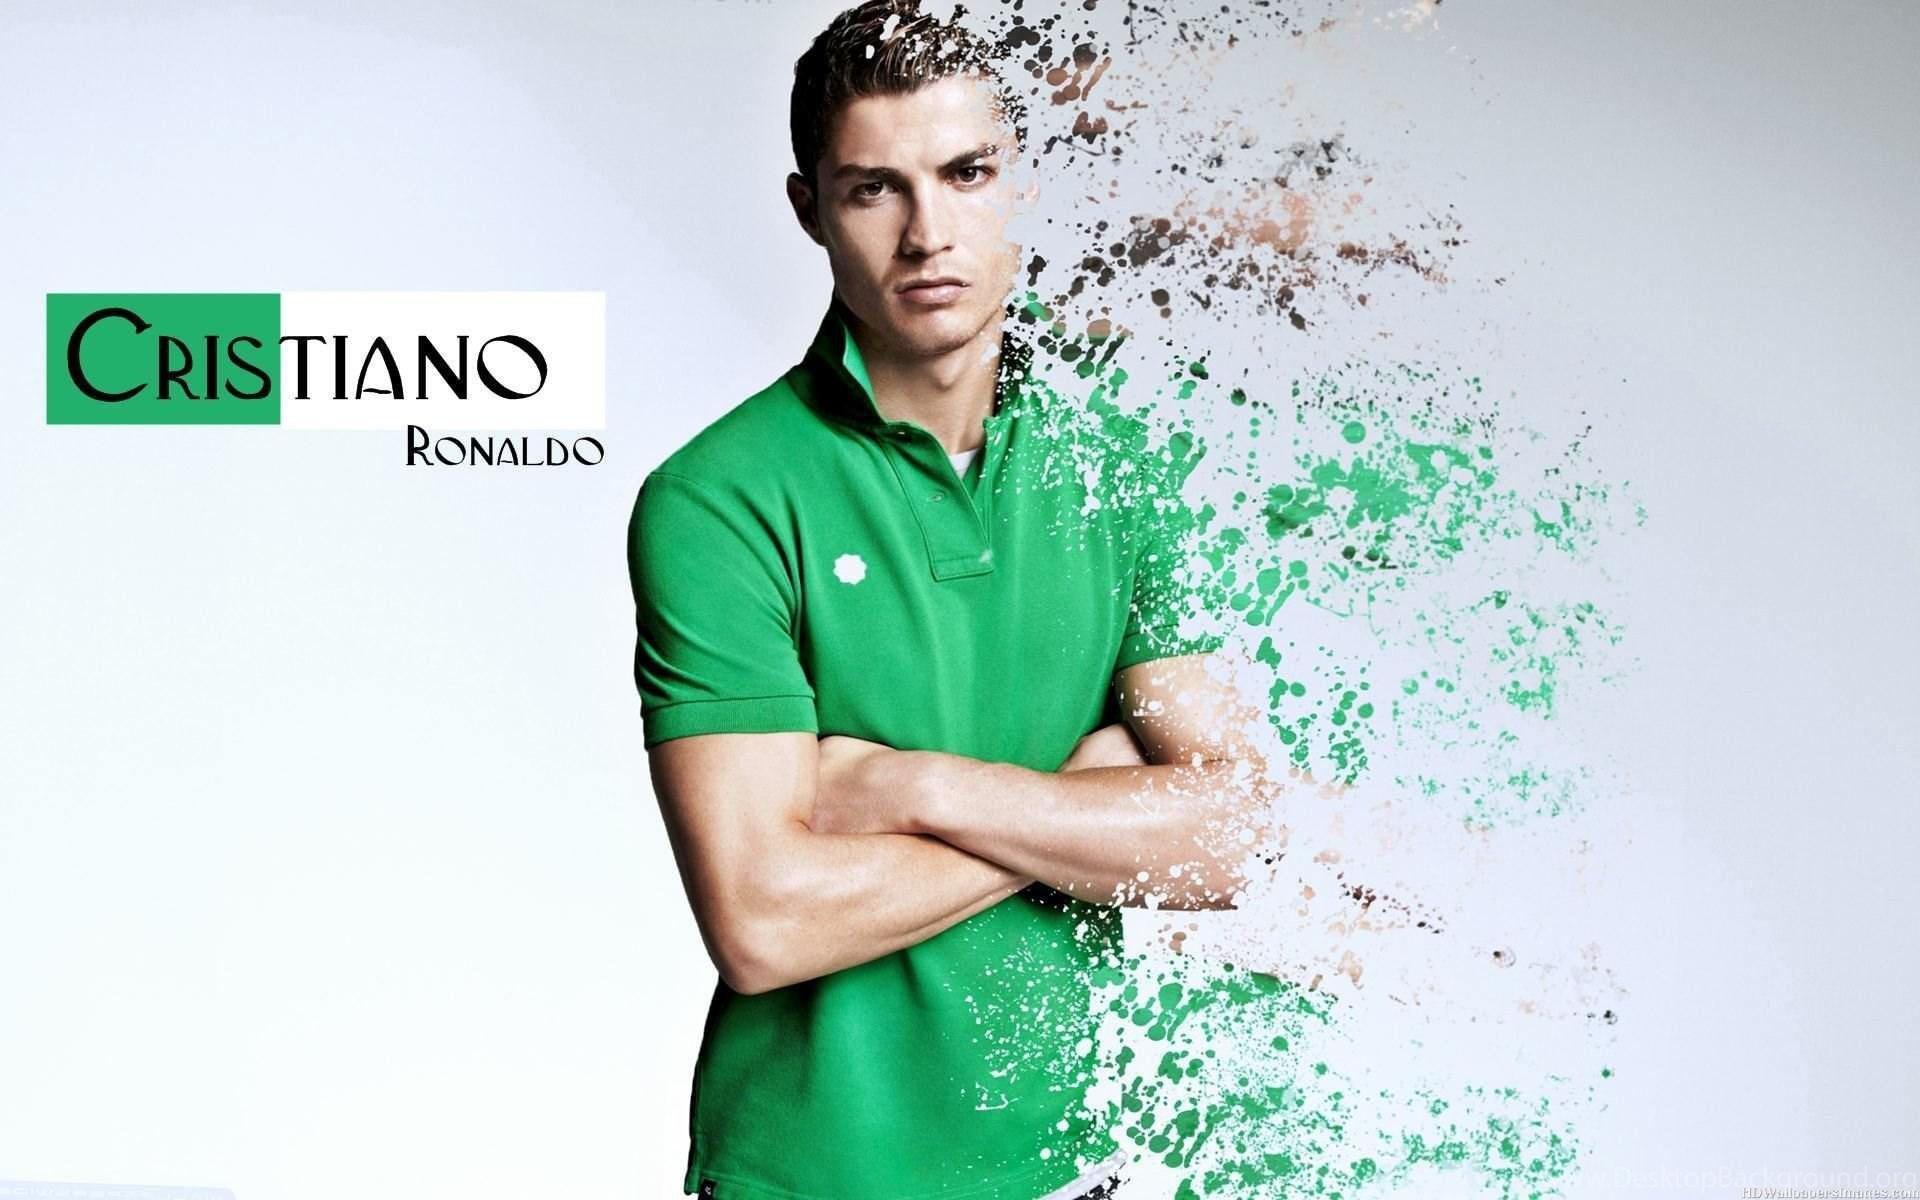 Cristiano Ronaldo In Green Shirt Wallpapers Cristiano Ronaldo Desktop Background